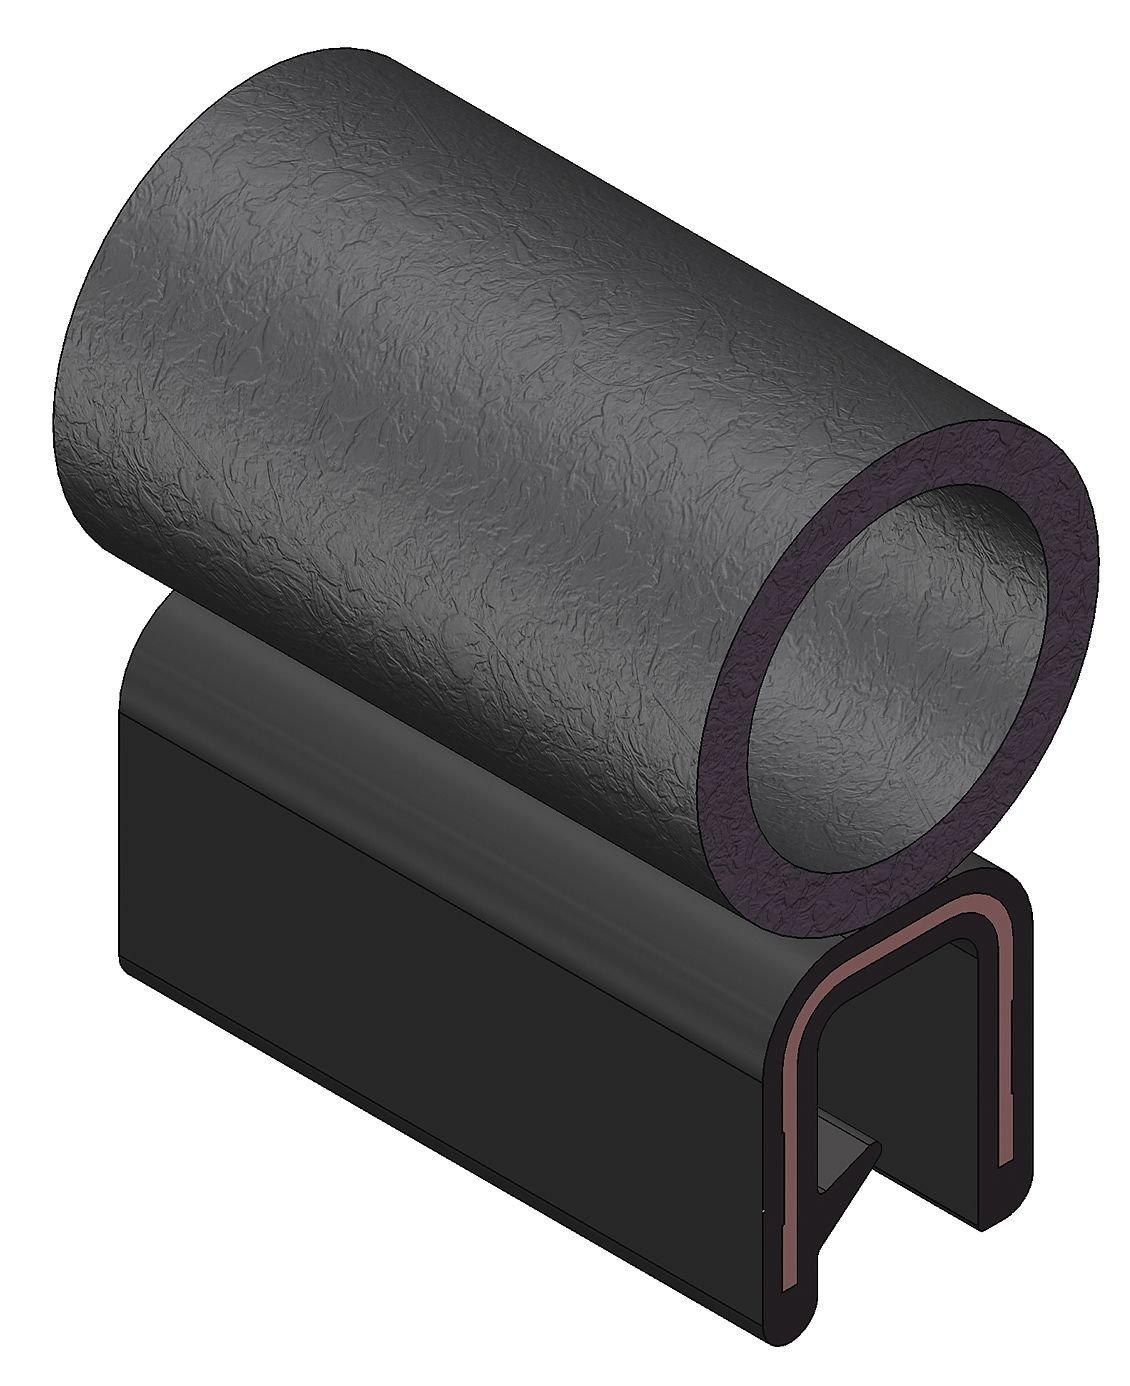 "Trim-Lok Trim Seal with Top Bulb – PVC Plastic Trim with EPDM Rubber Bulb Seal – Fits 5/32"" Edge, 5/8"" Bulb Seal Diameter, 250' Length"